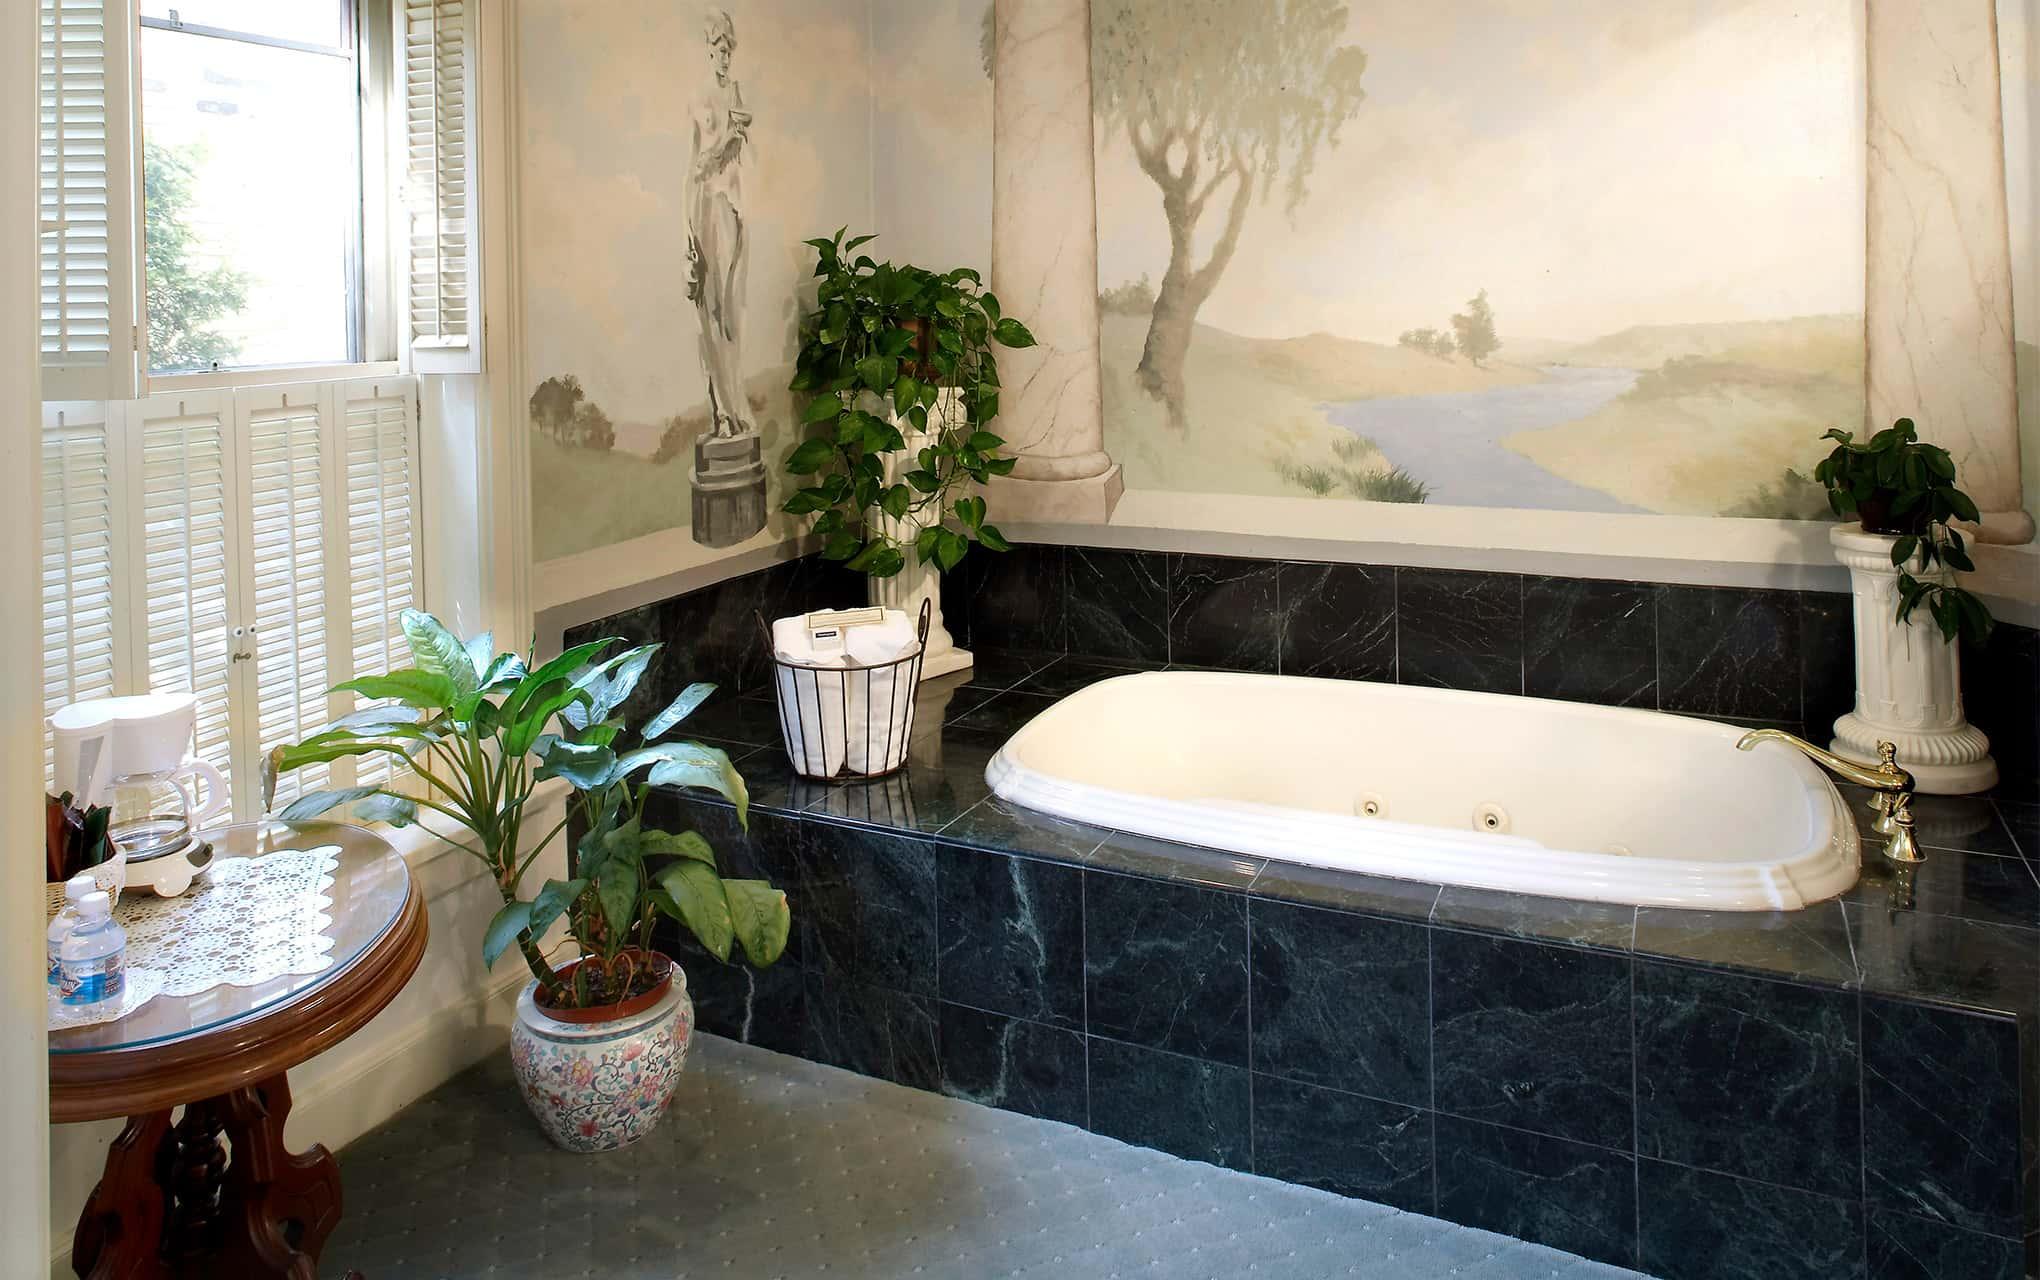 A large soaking tub at the Washington House Inn